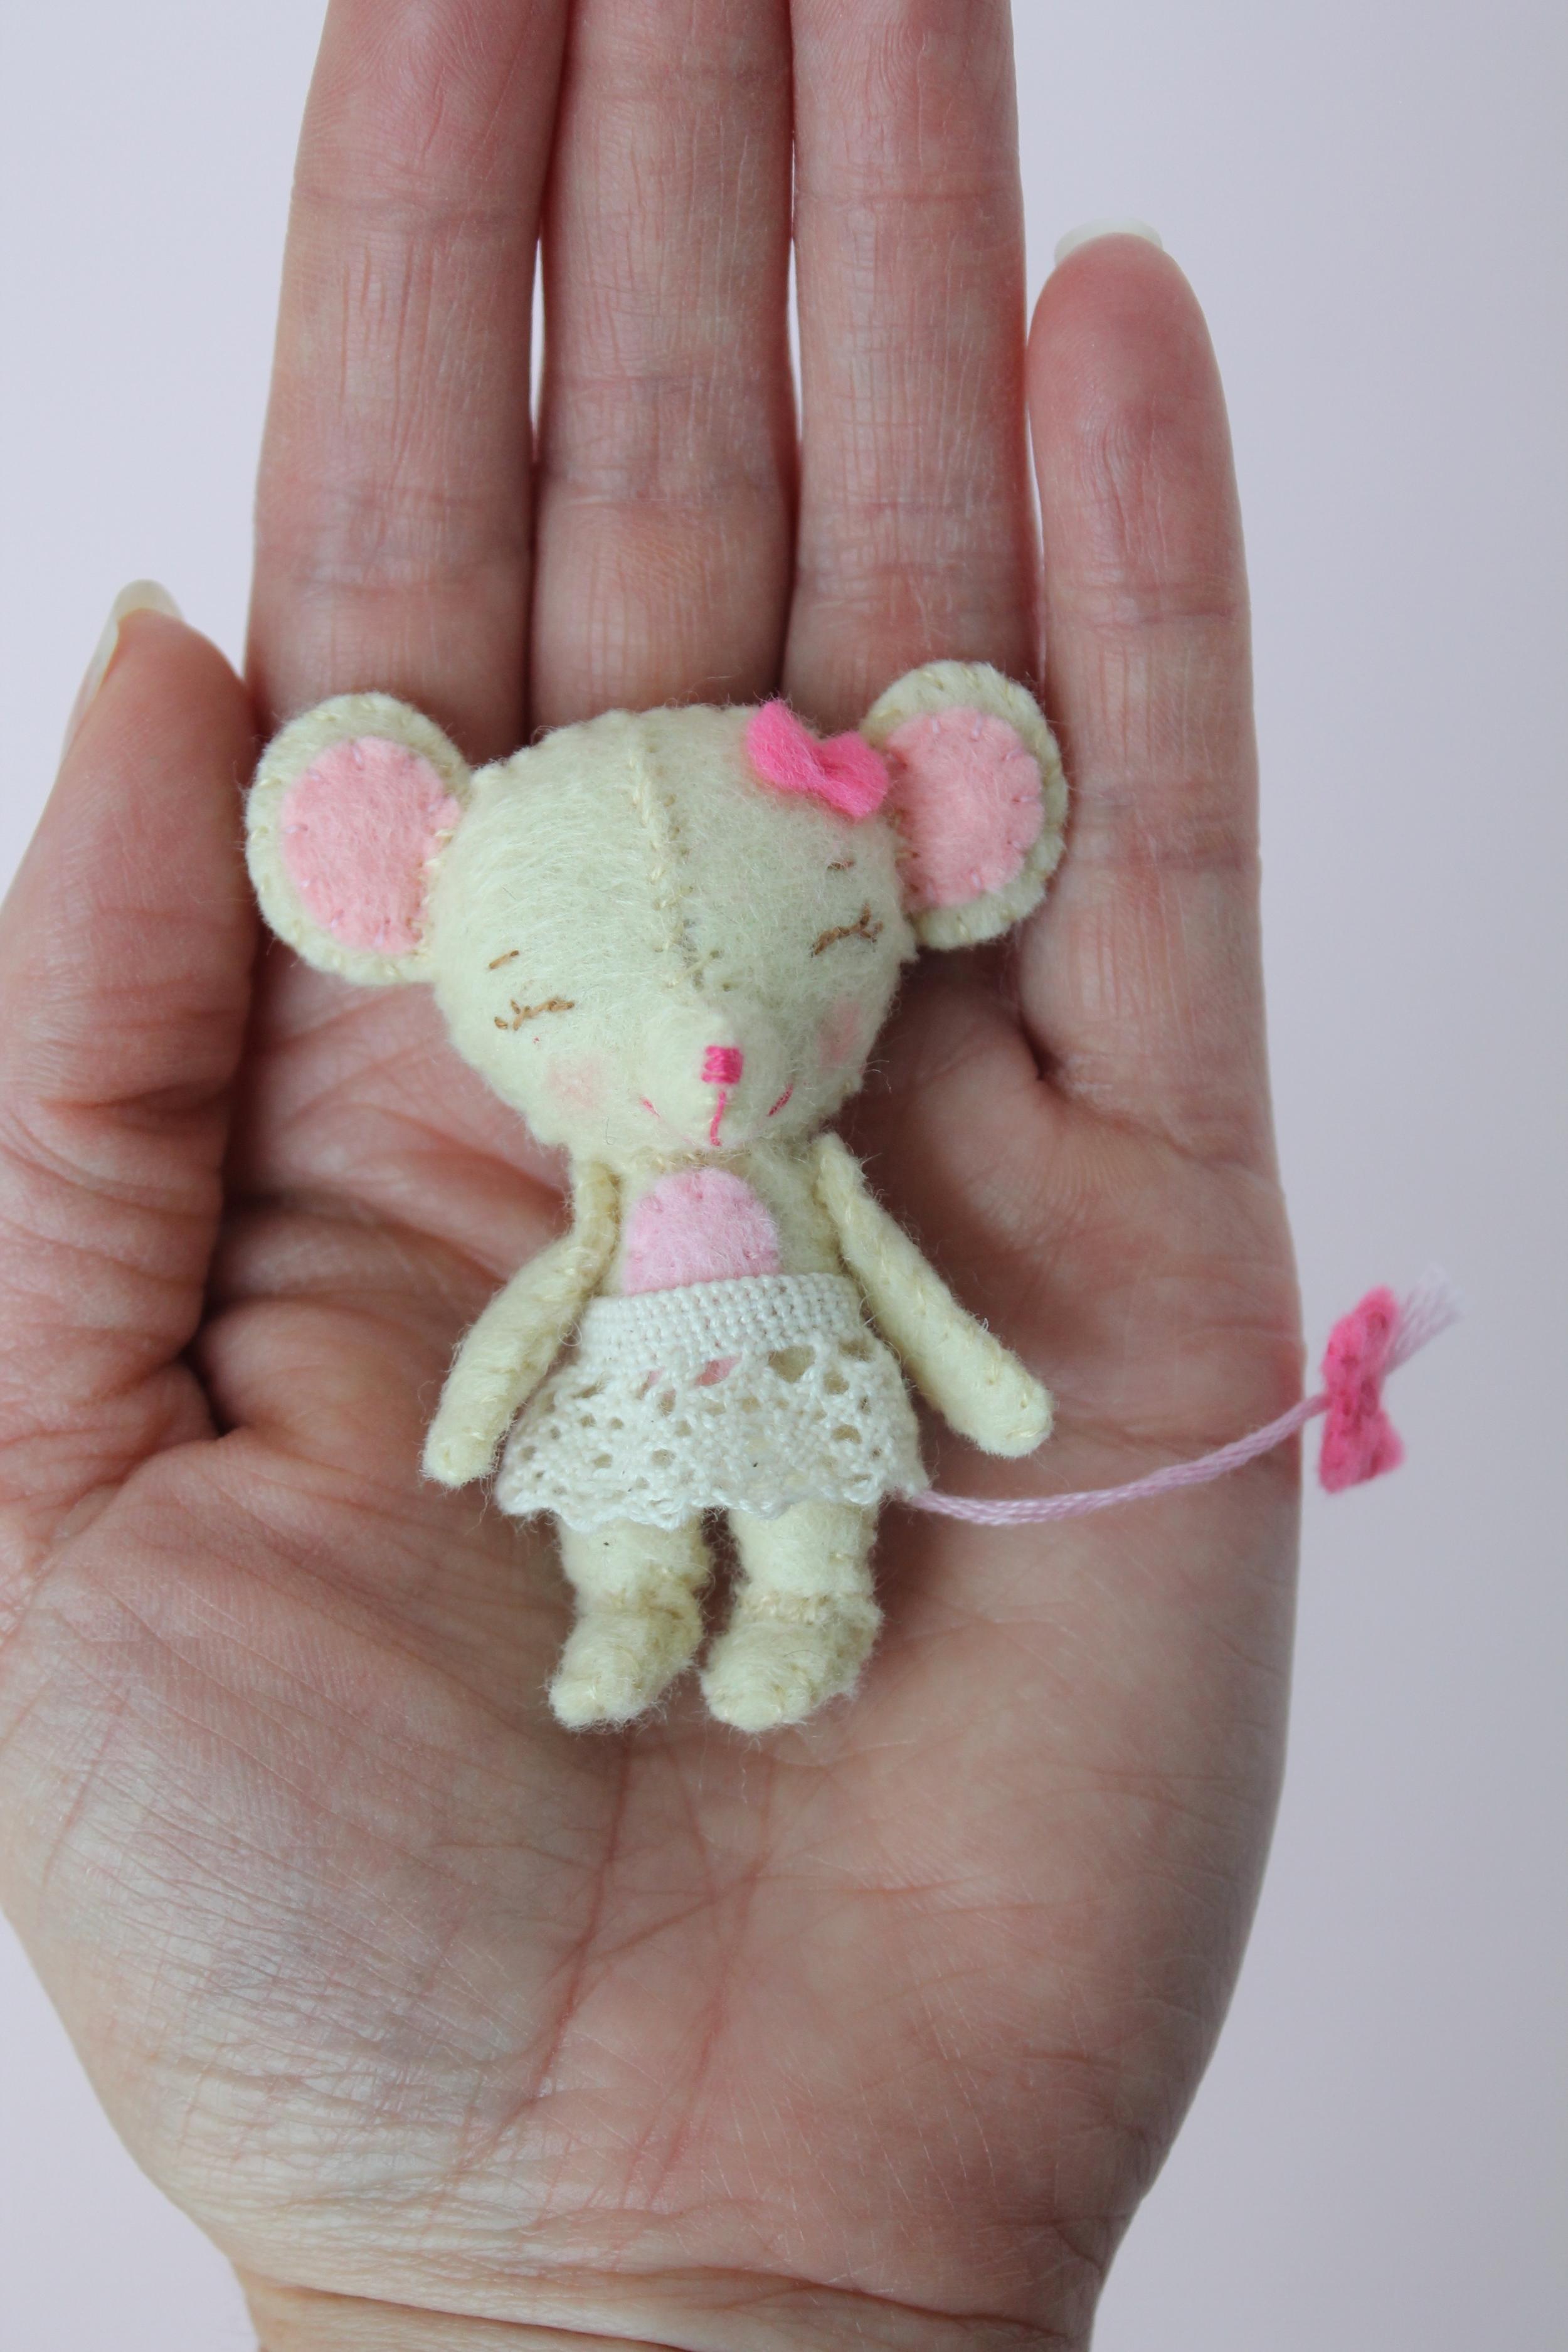 Tiny Felt mouse. Pattern from Gingermelon ETSY shop.